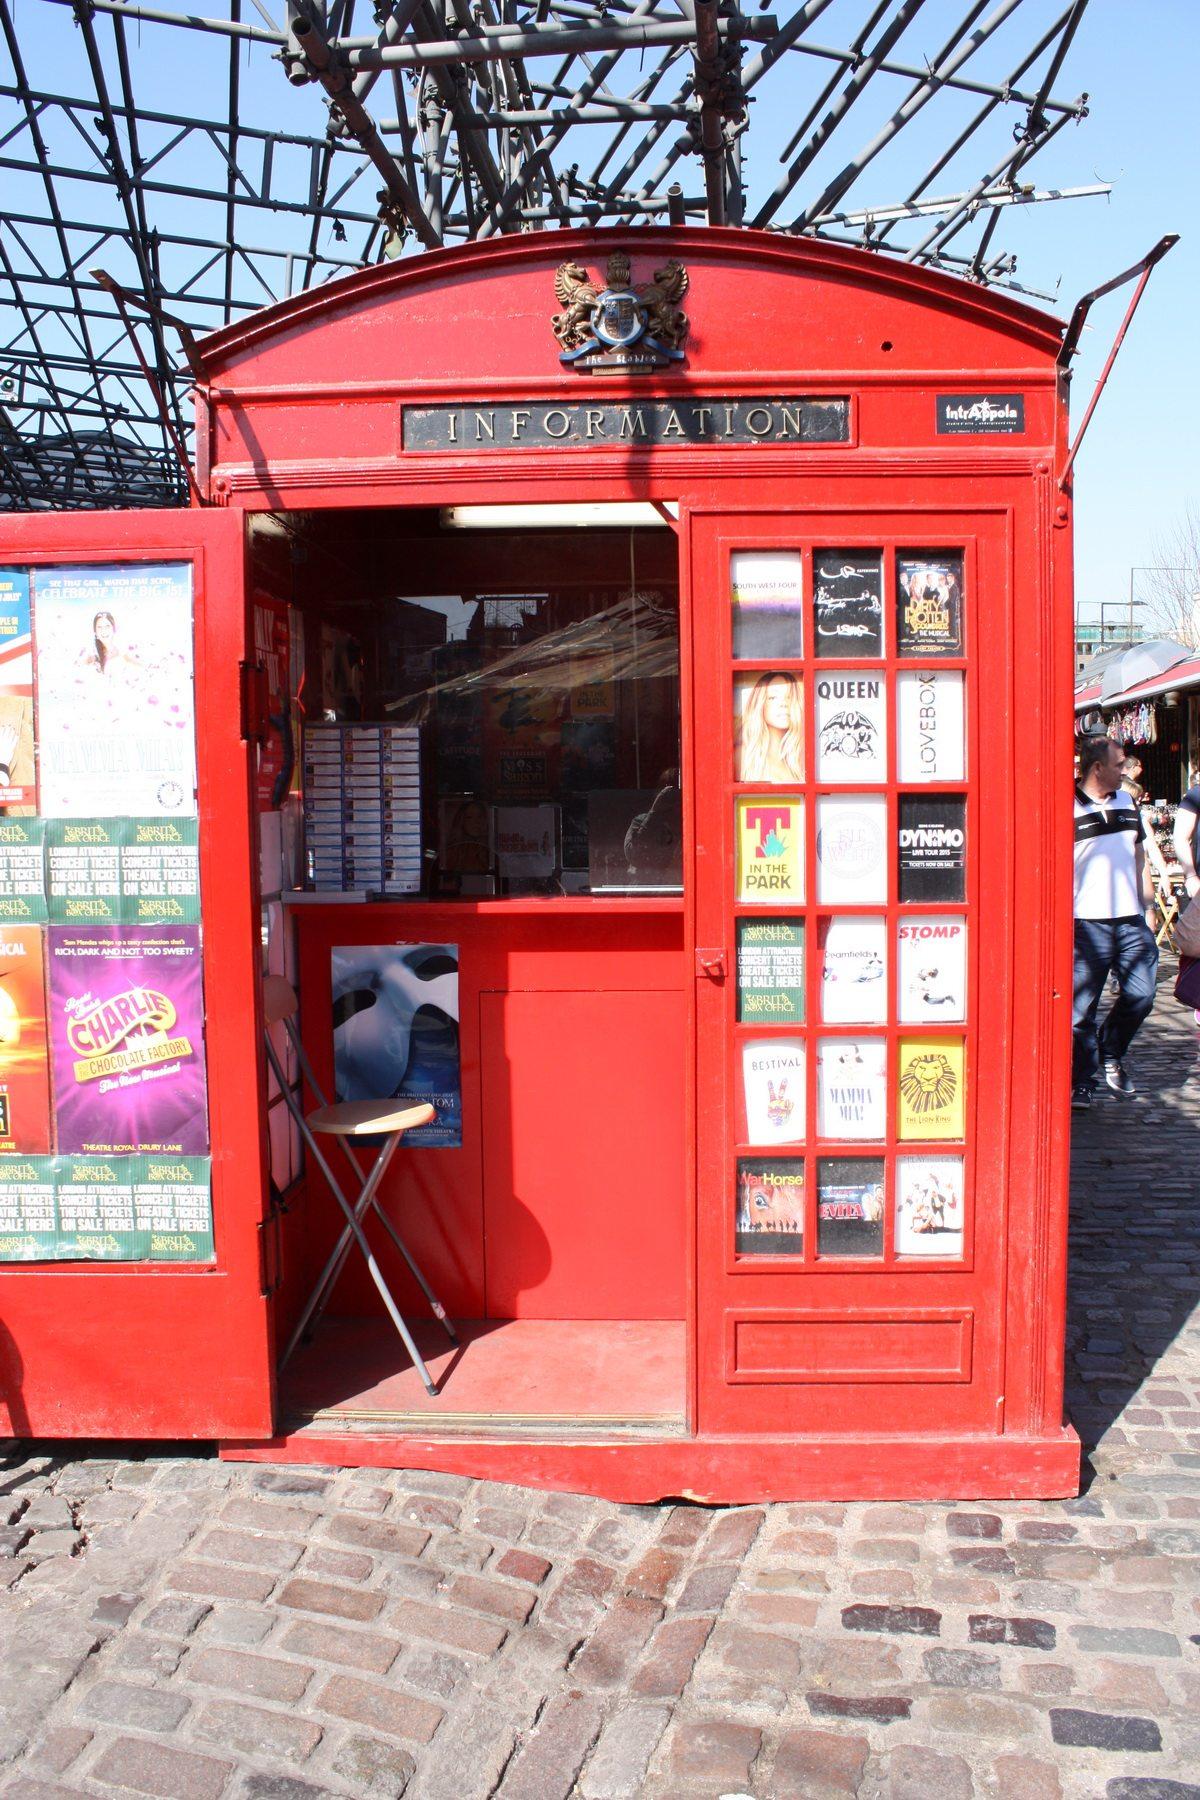 Telephone Information Box